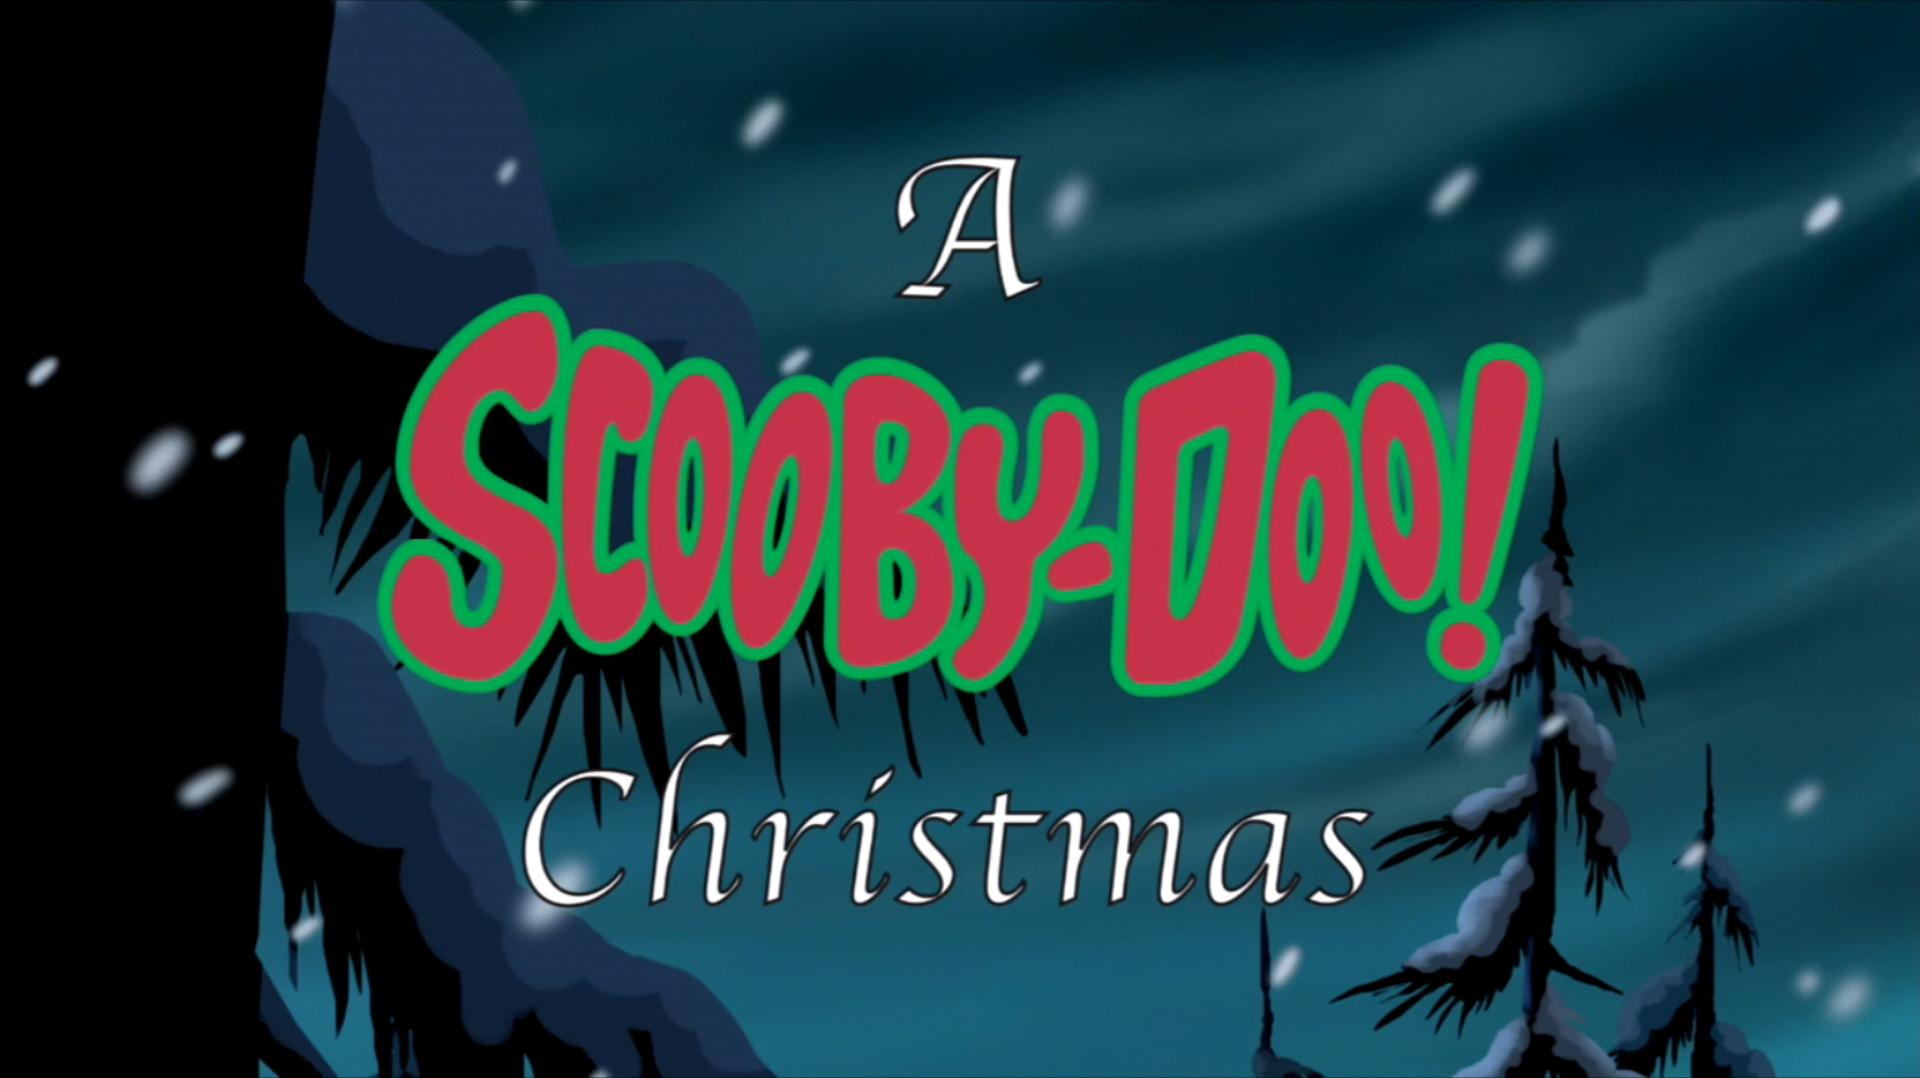 A Scooby-Doo! Christmas | Christmas Specials Wiki | FANDOM powered ...